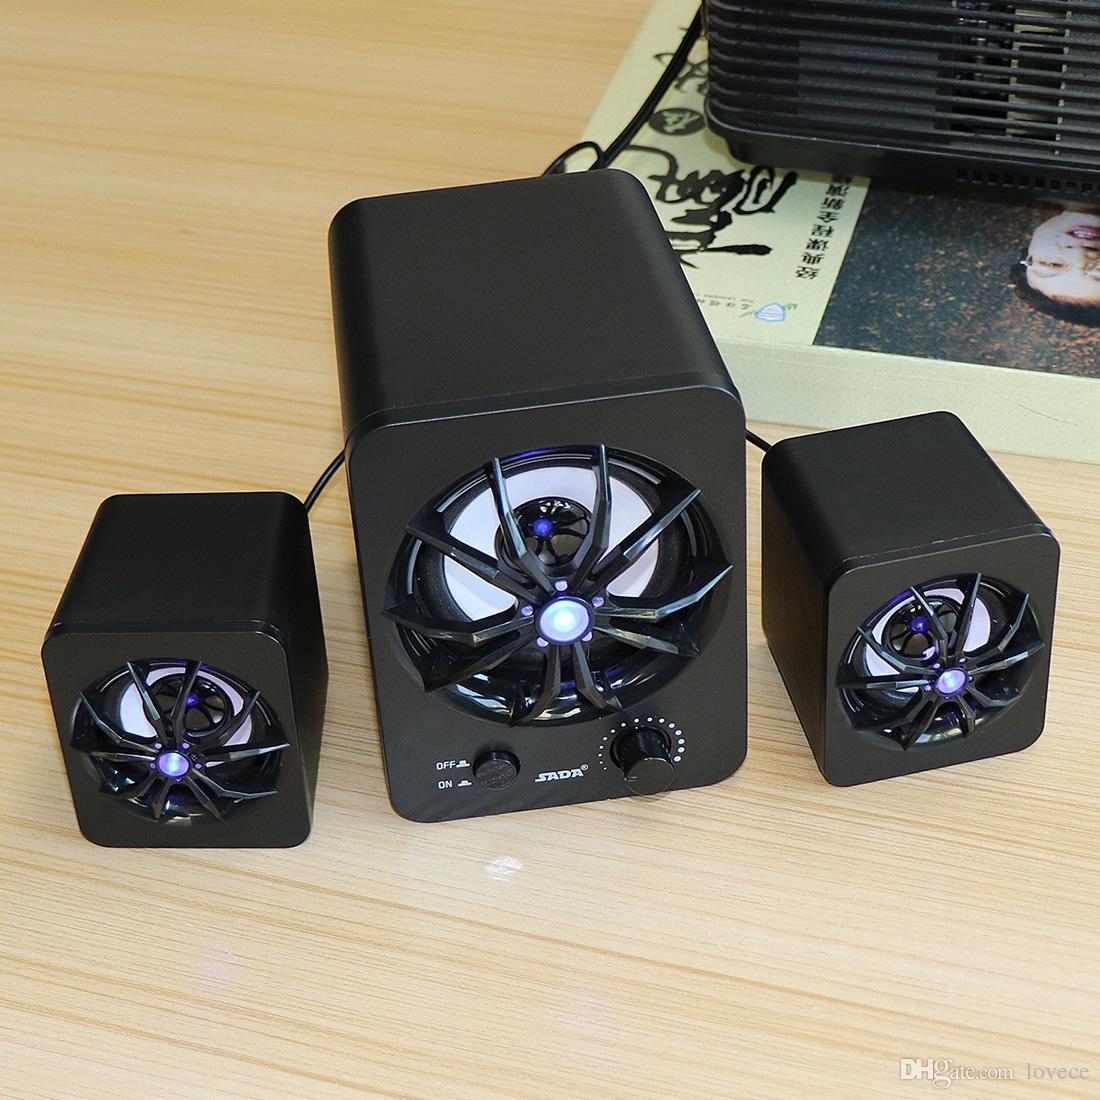 SADA LED 2.1 Subwoofer 3 Channel Speaker USB بدعم نشط مزيج الوسائط المتعددة للكمبيوتر المكتبي المحمول الكمبيوتر المحمول MP3 PMP_71A